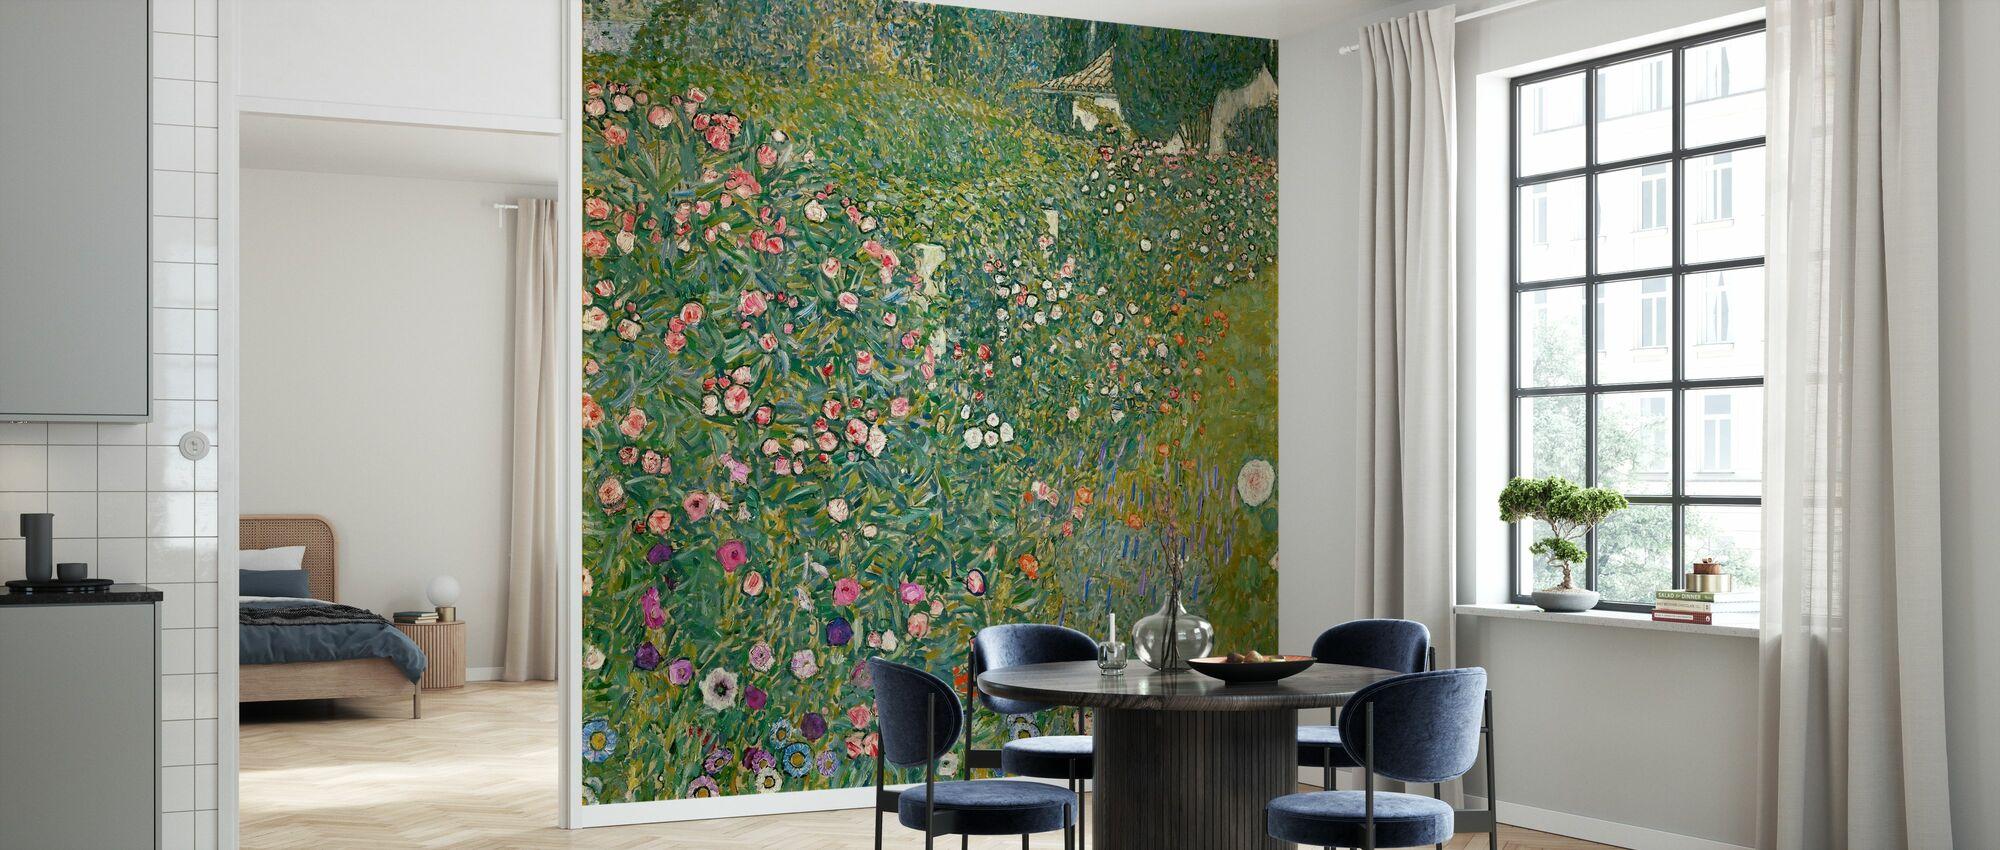 Klimt, Gustav - Italian Garden Landscape - Wallpaper - Kitchen